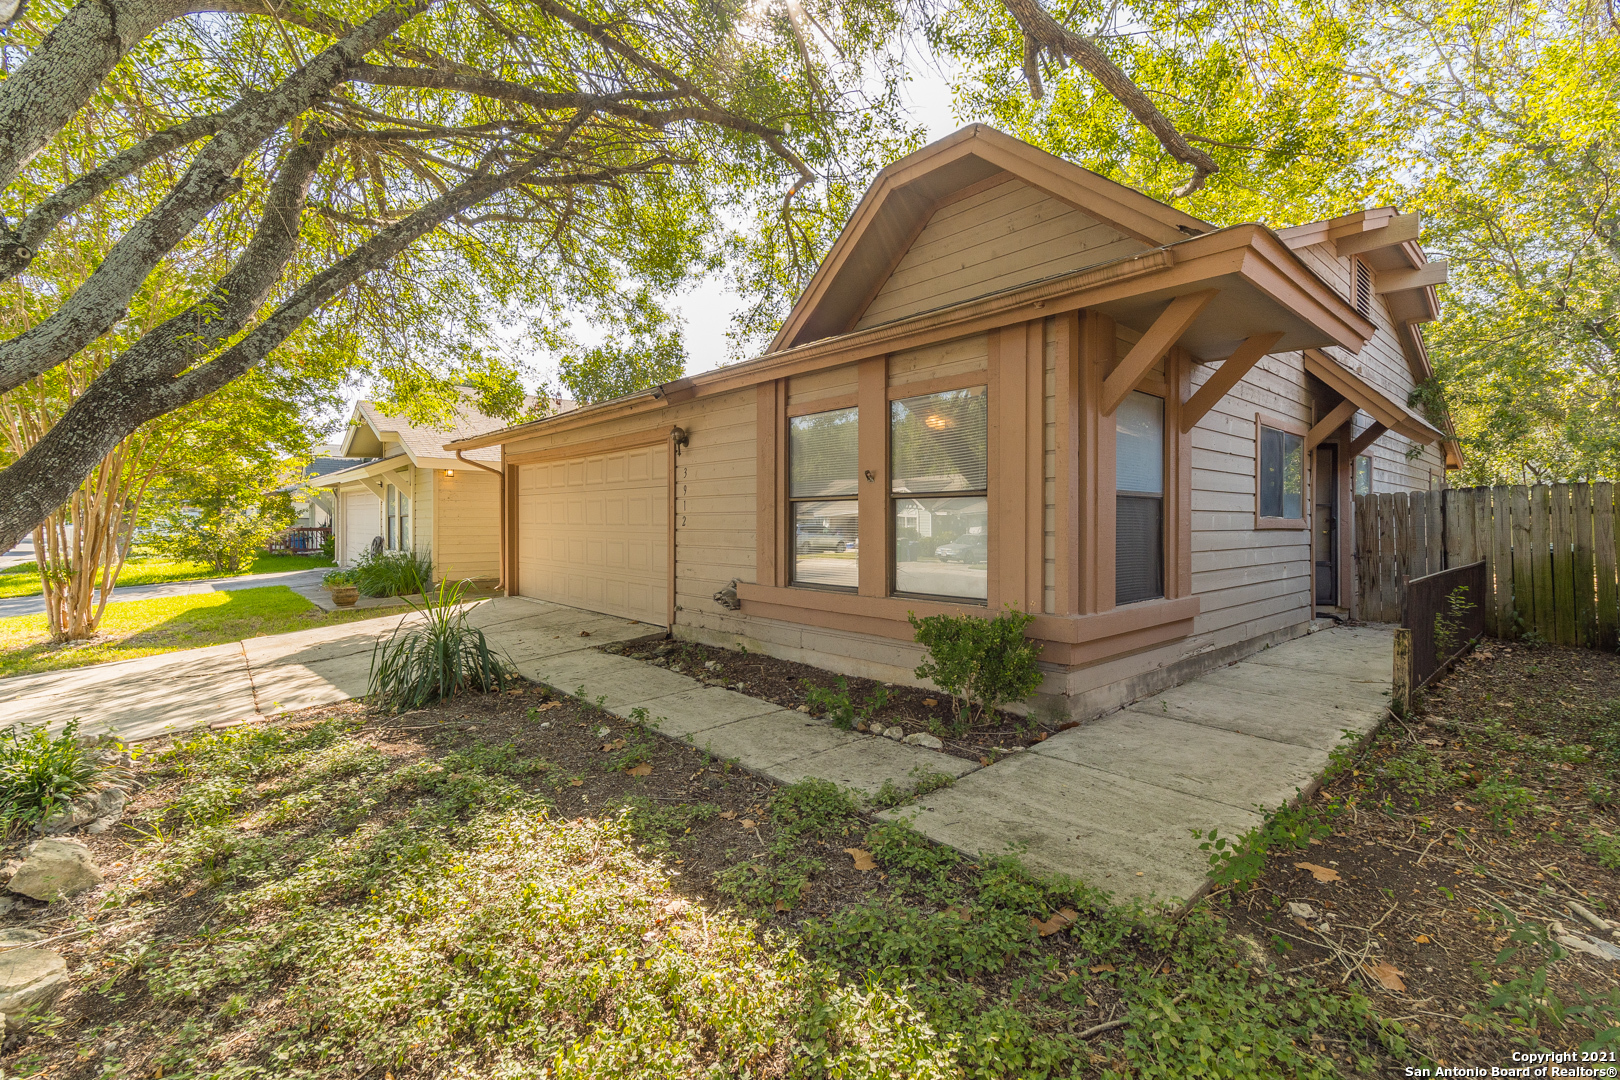 3912 HERITAGE HILL DR, San Antonio, TX 78247